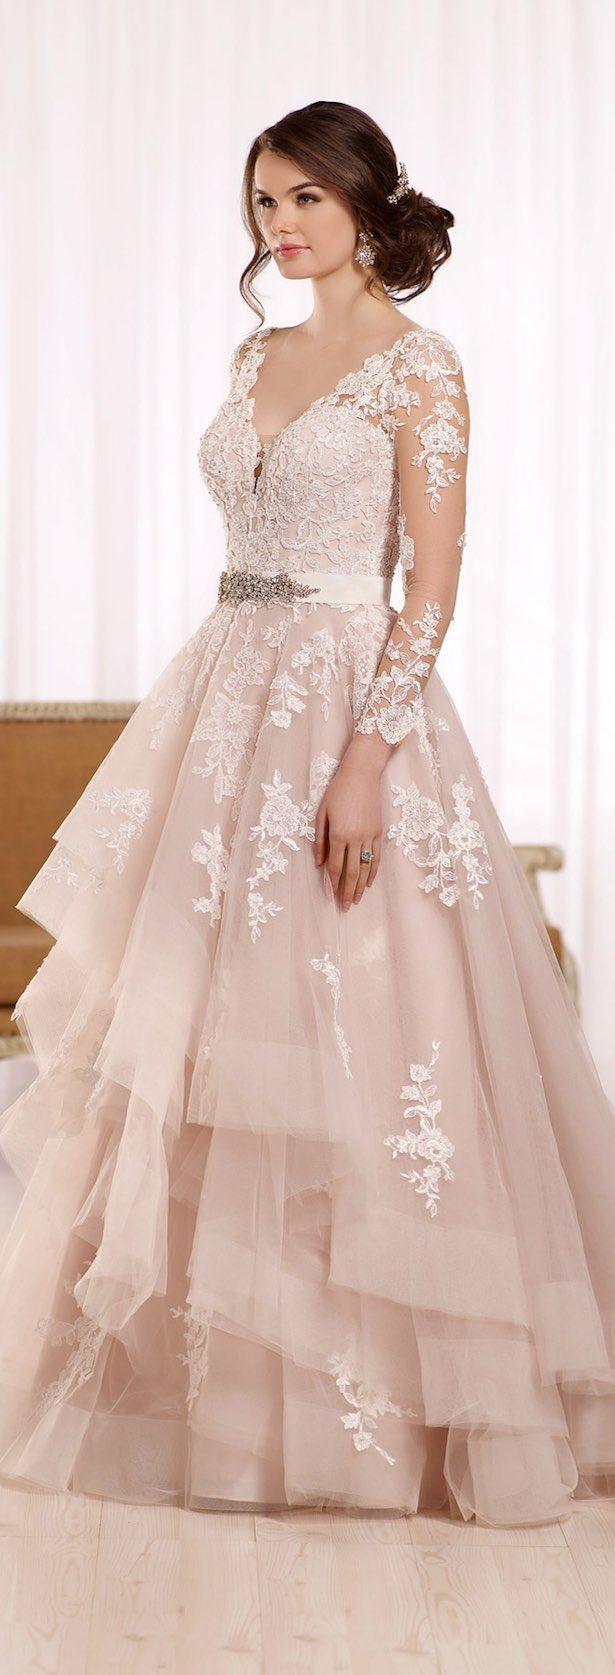 long wedding dress lace, wedding gown Essense of Australia Fall 2016 ...